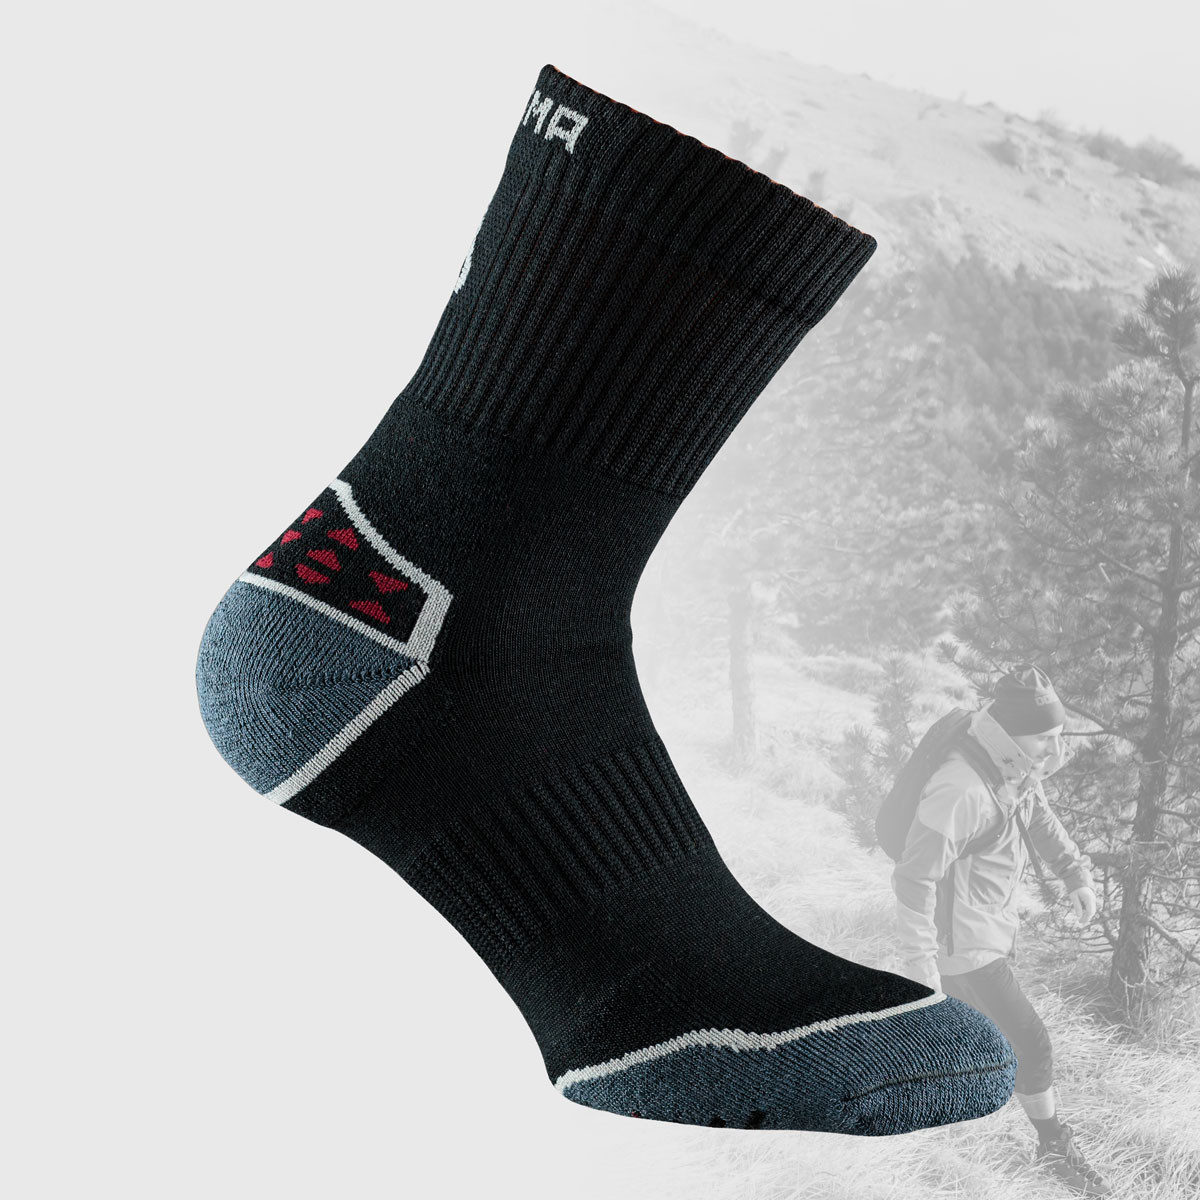 black hiking socks